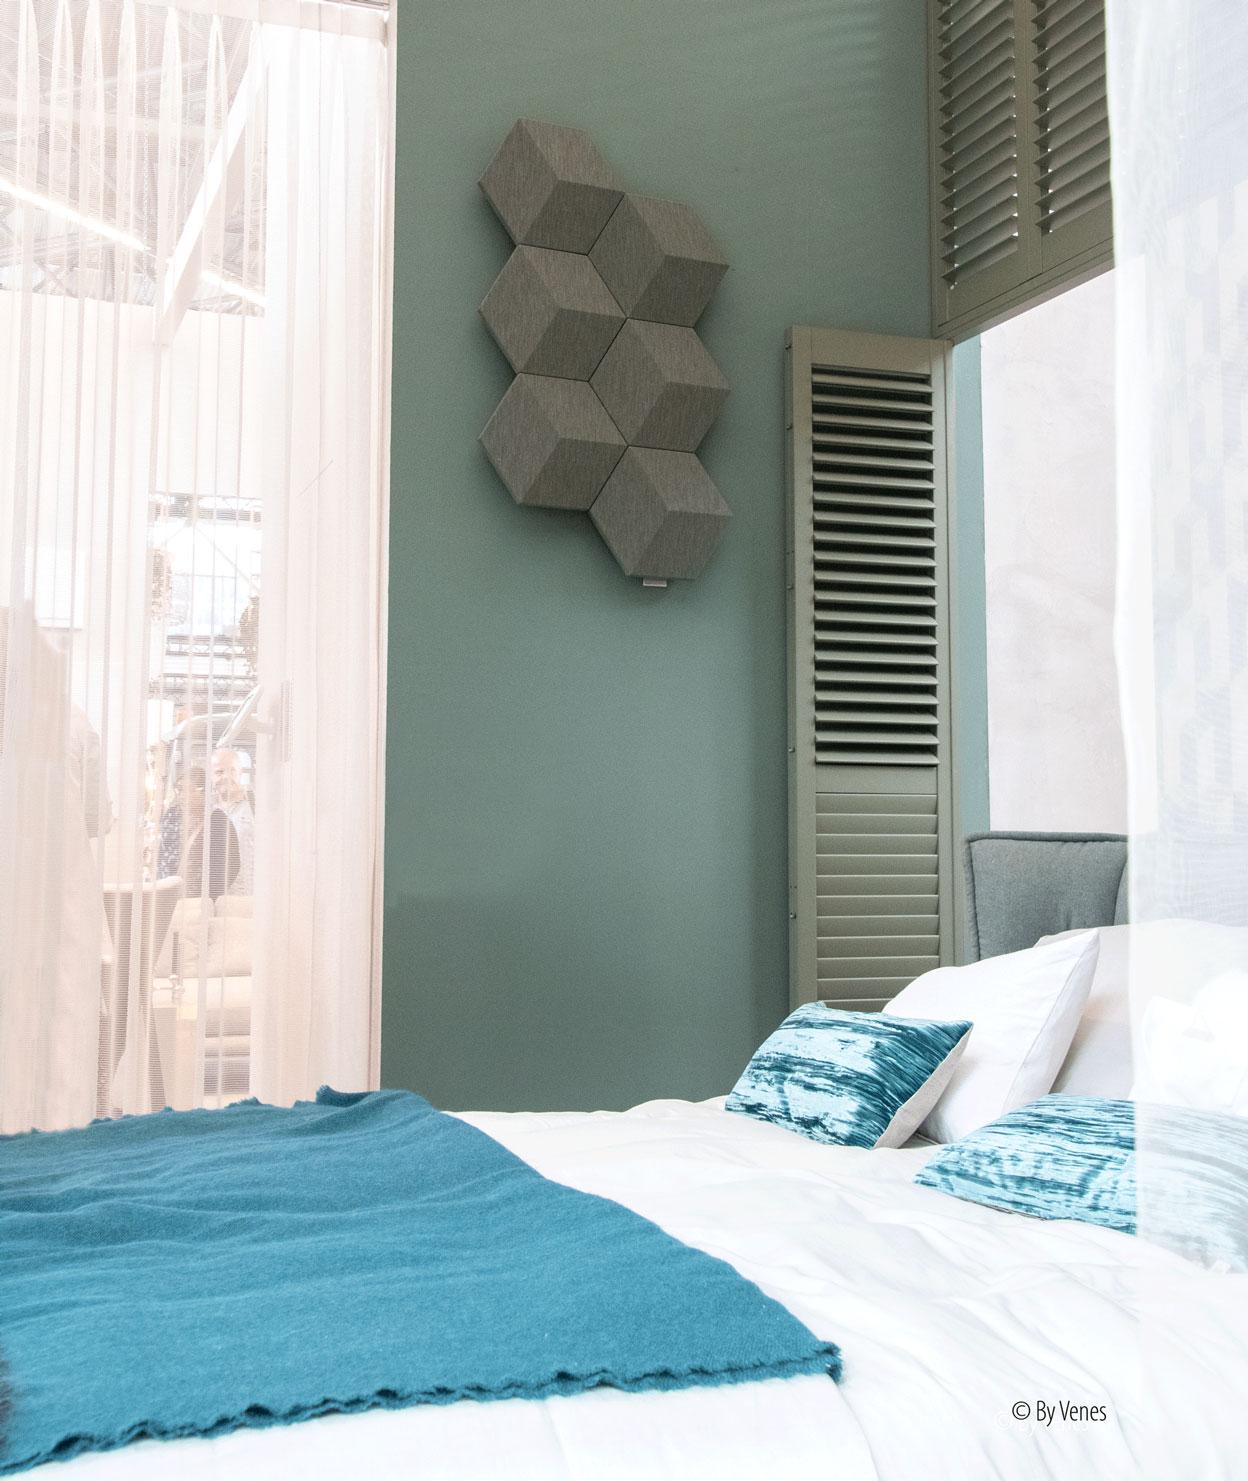 Stijlvol wonen Bang & Olufsen luidsprekersysteem Wanddecoratie